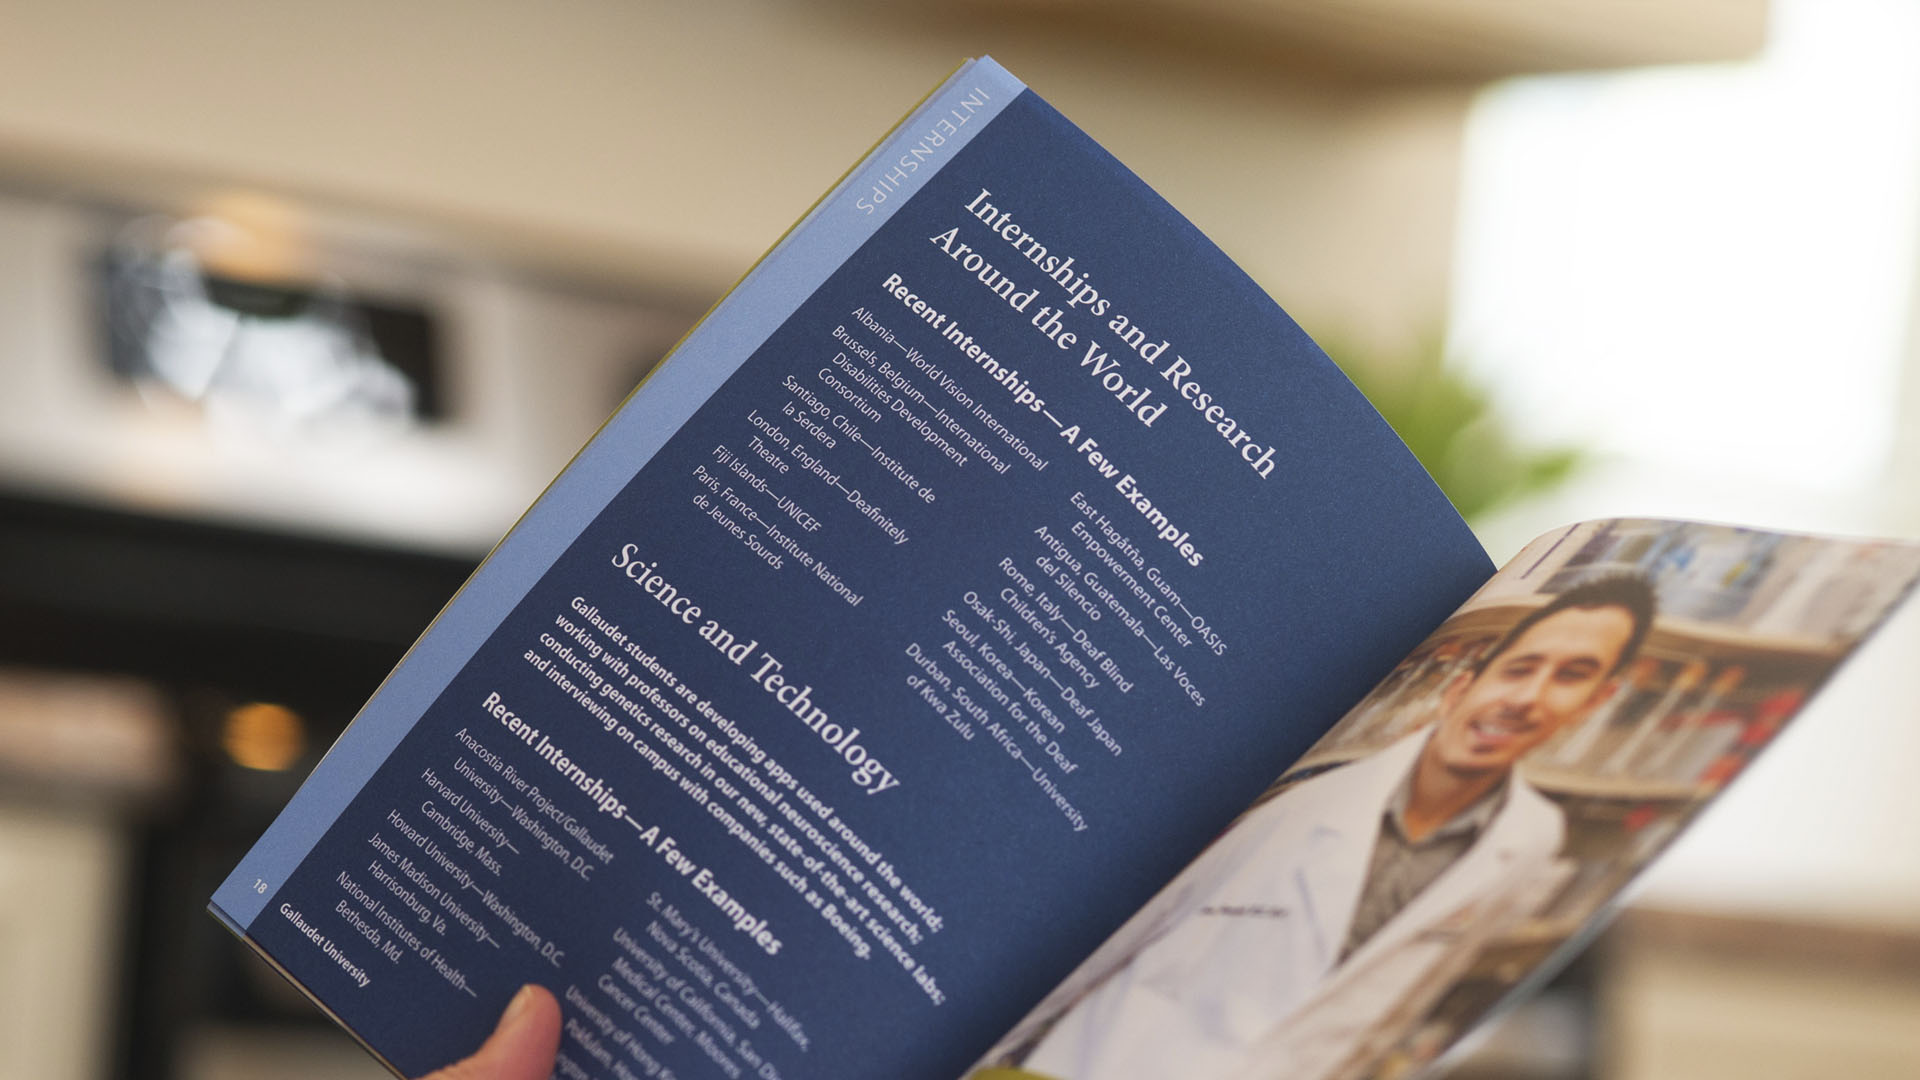 Gallaudet-University-Branding-Marketing-Admissions-Viewbook_07.jpg